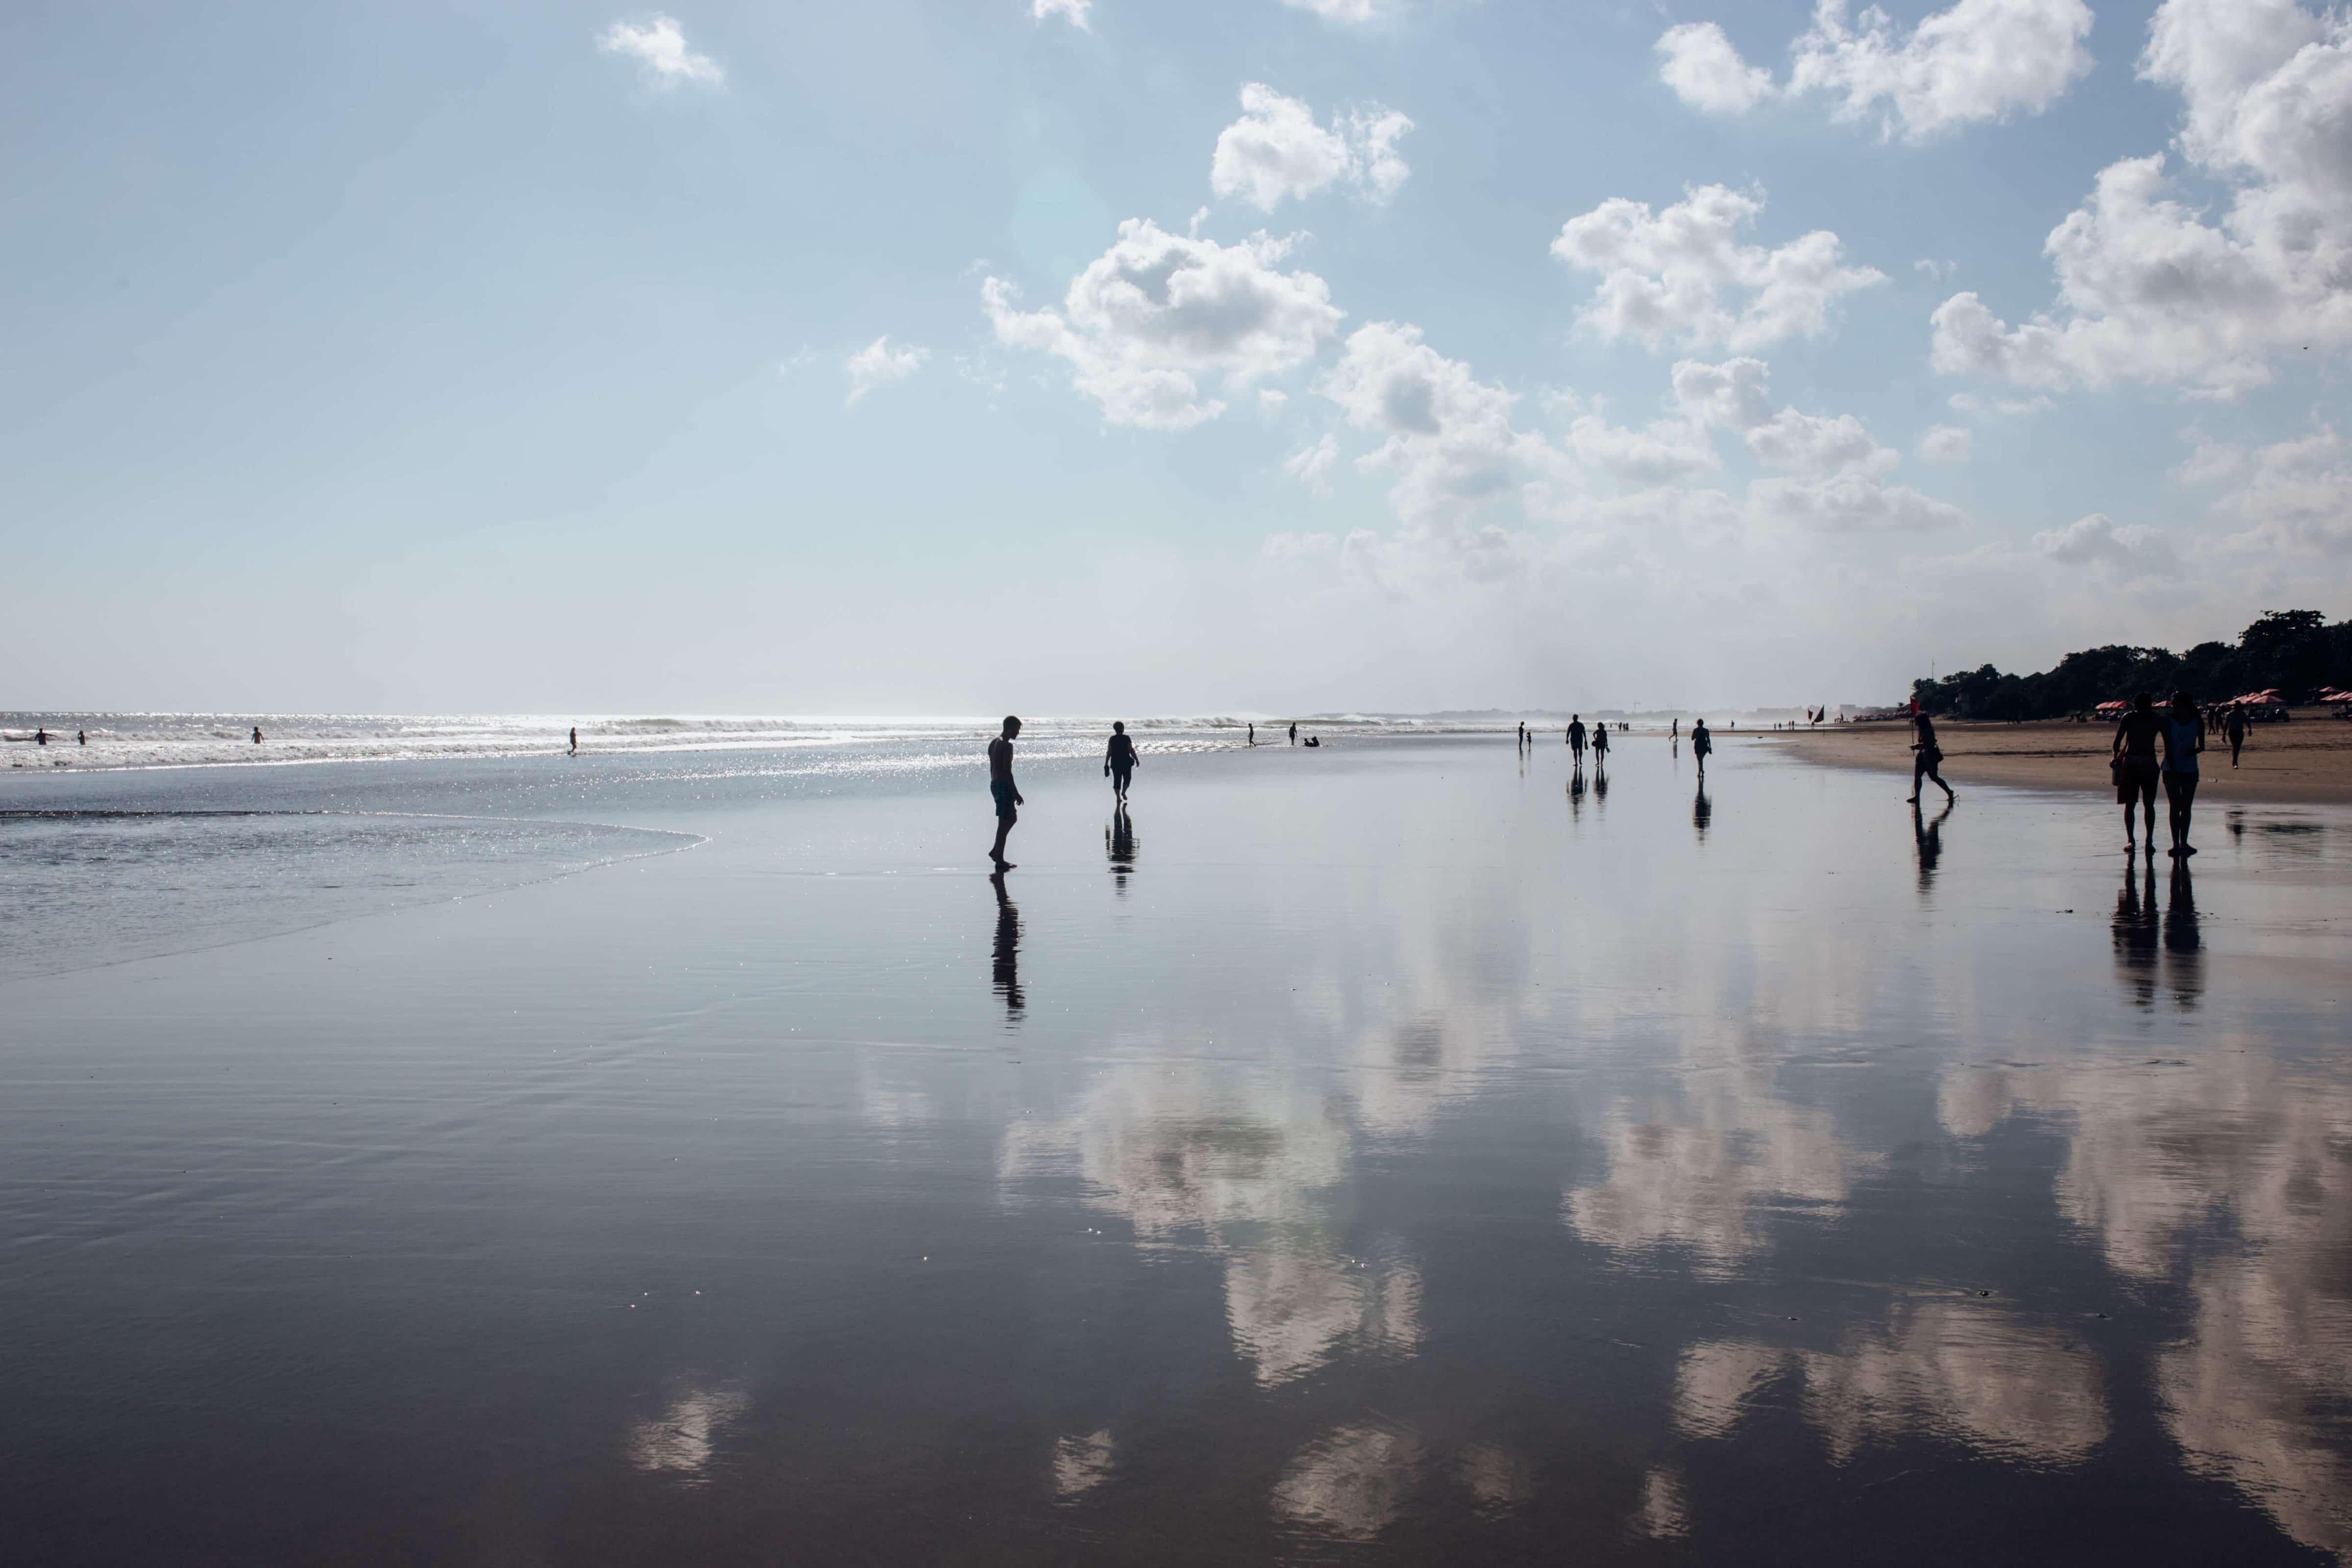 bali-nusa-lembonwan-beach-reflections